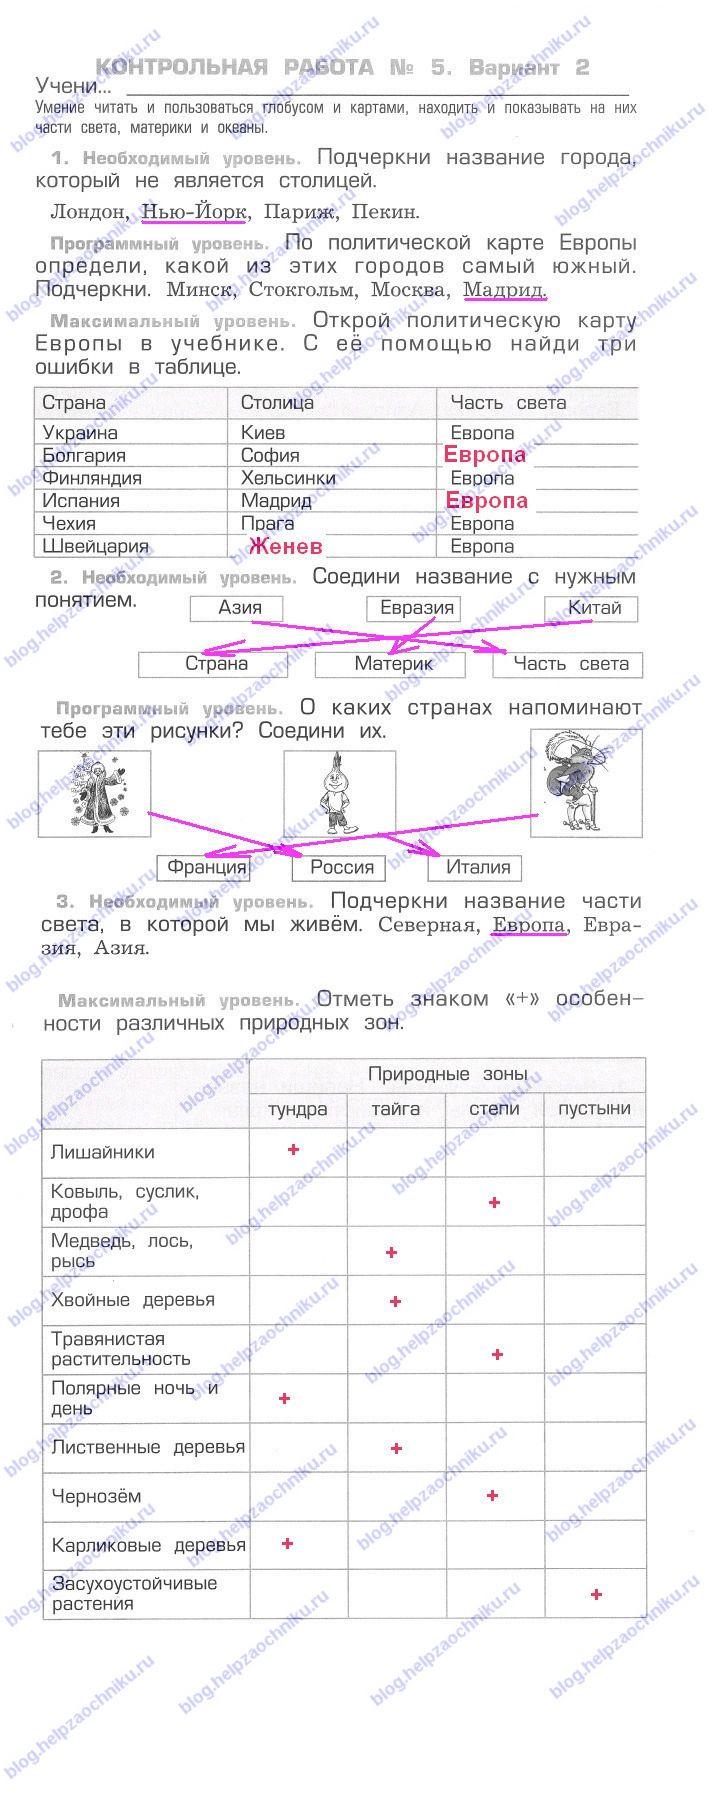 Тест за 1 полугодие по биологии 9 класс пономарева